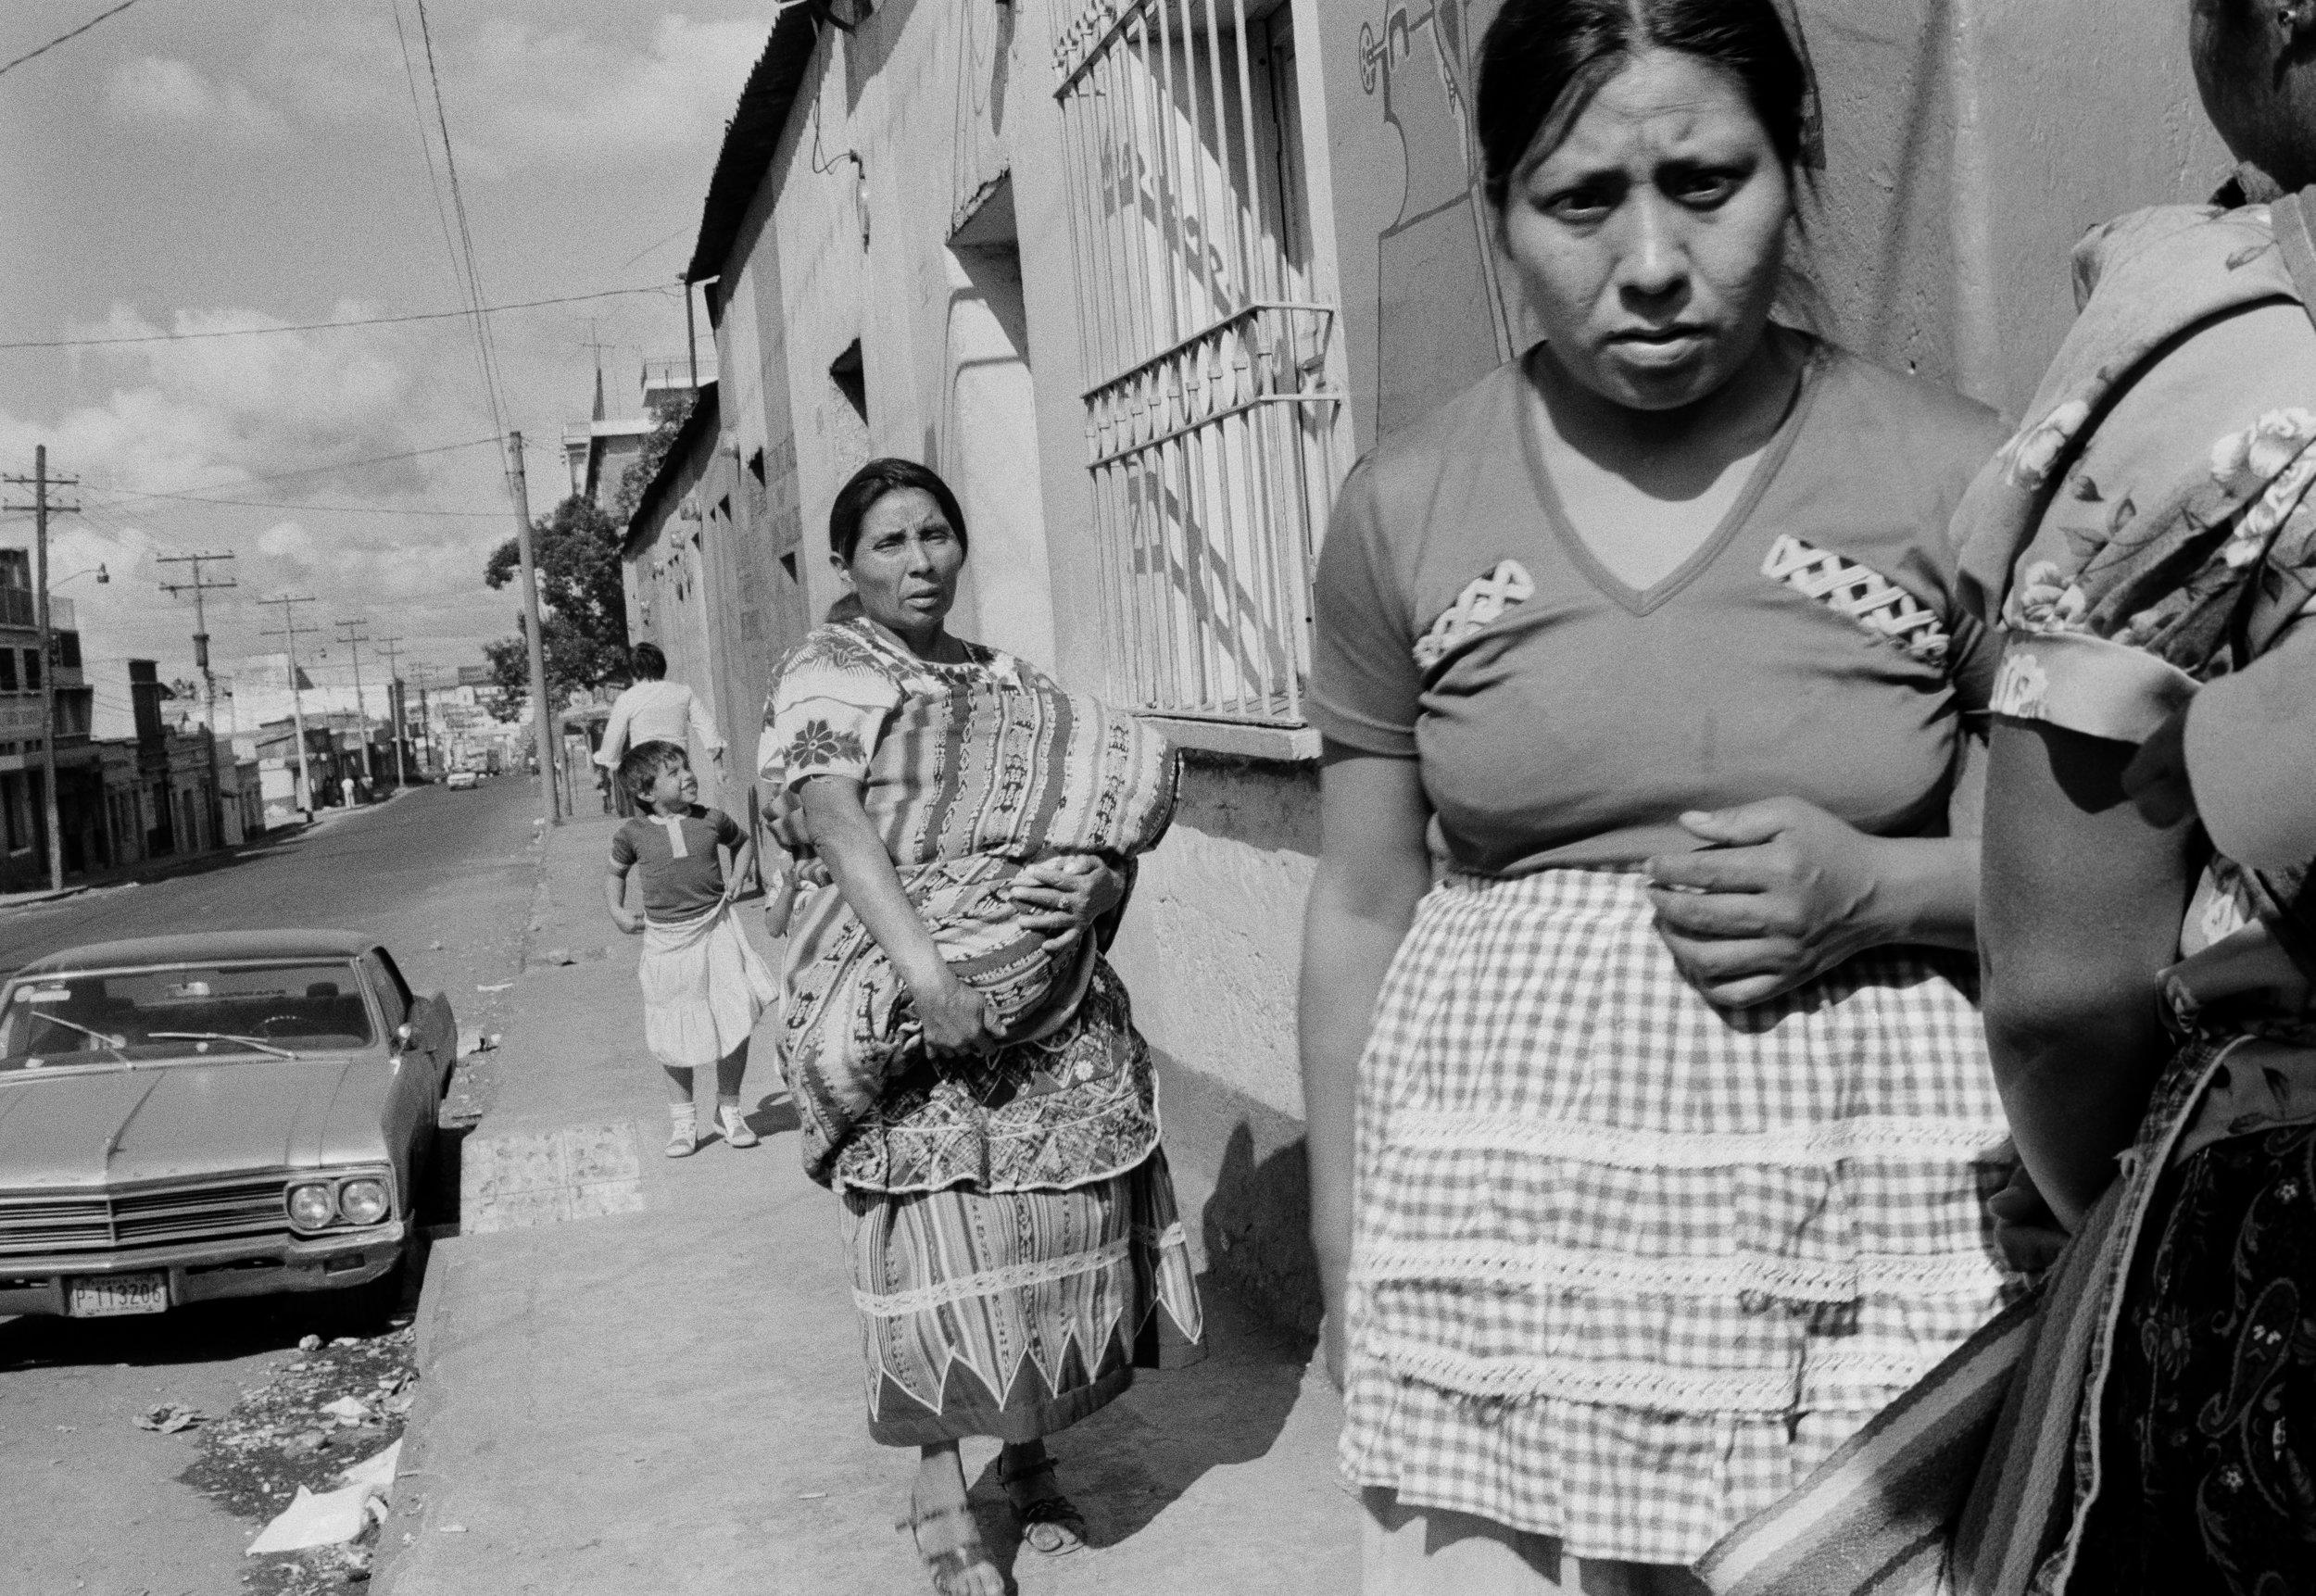 Women walk along a downtown street October 15, 1982 in Guatemala City, Guatemala.